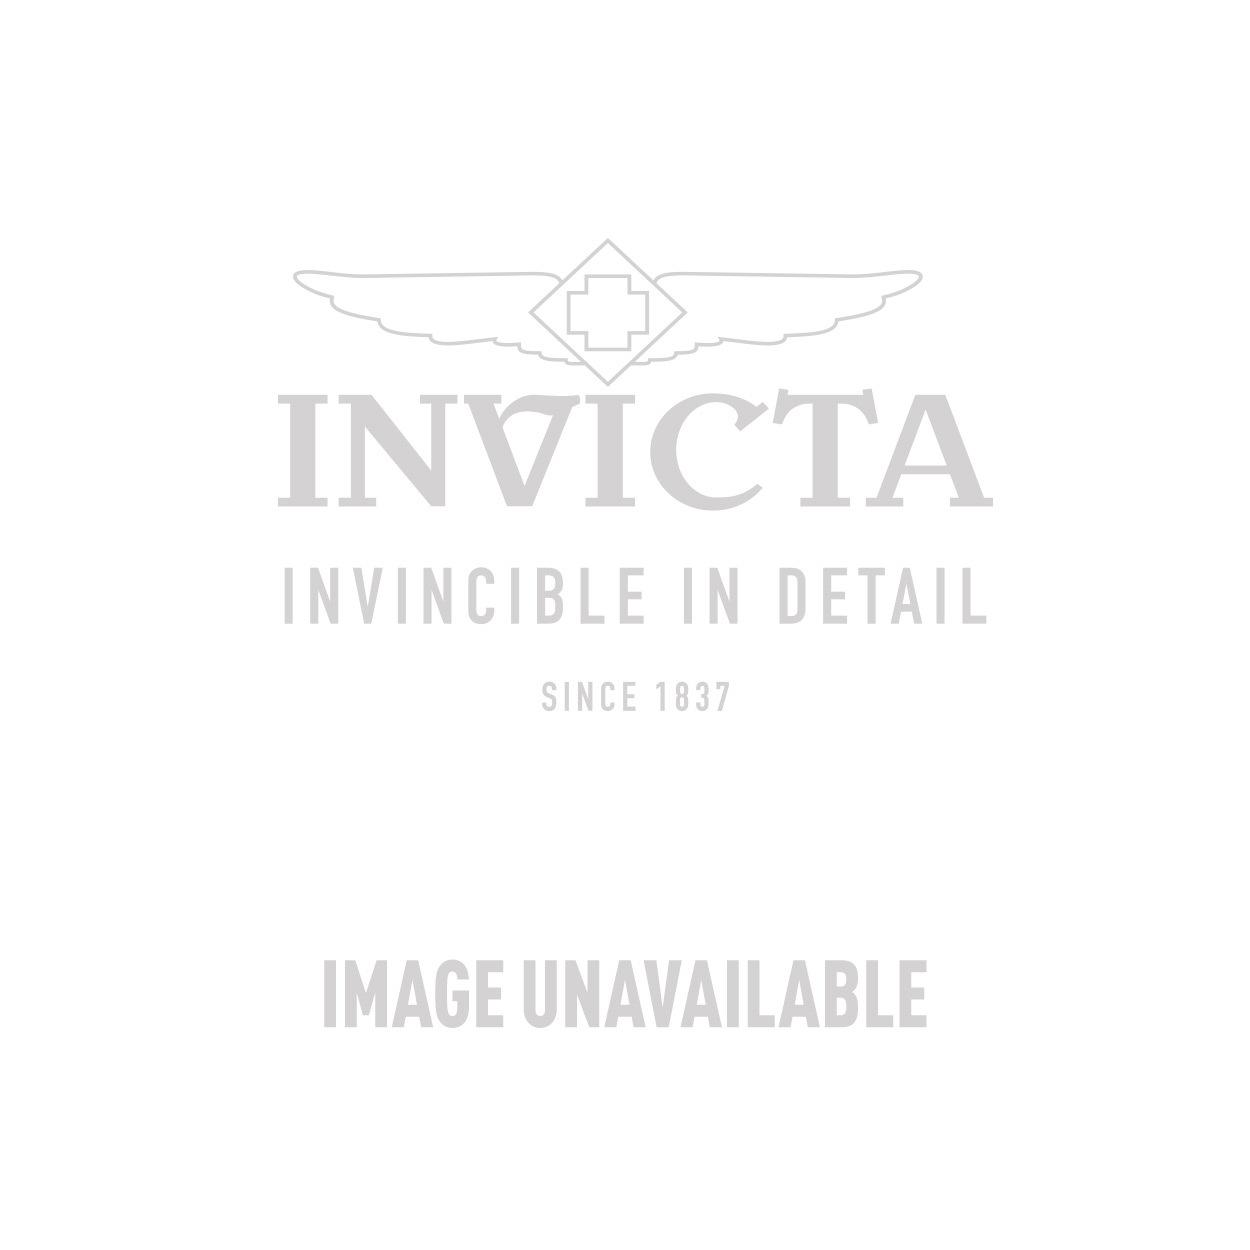 Invicta Pro Diver Men's Quartz 44mm Stainless Steel Case Greyish Blue Dial - Model 90295